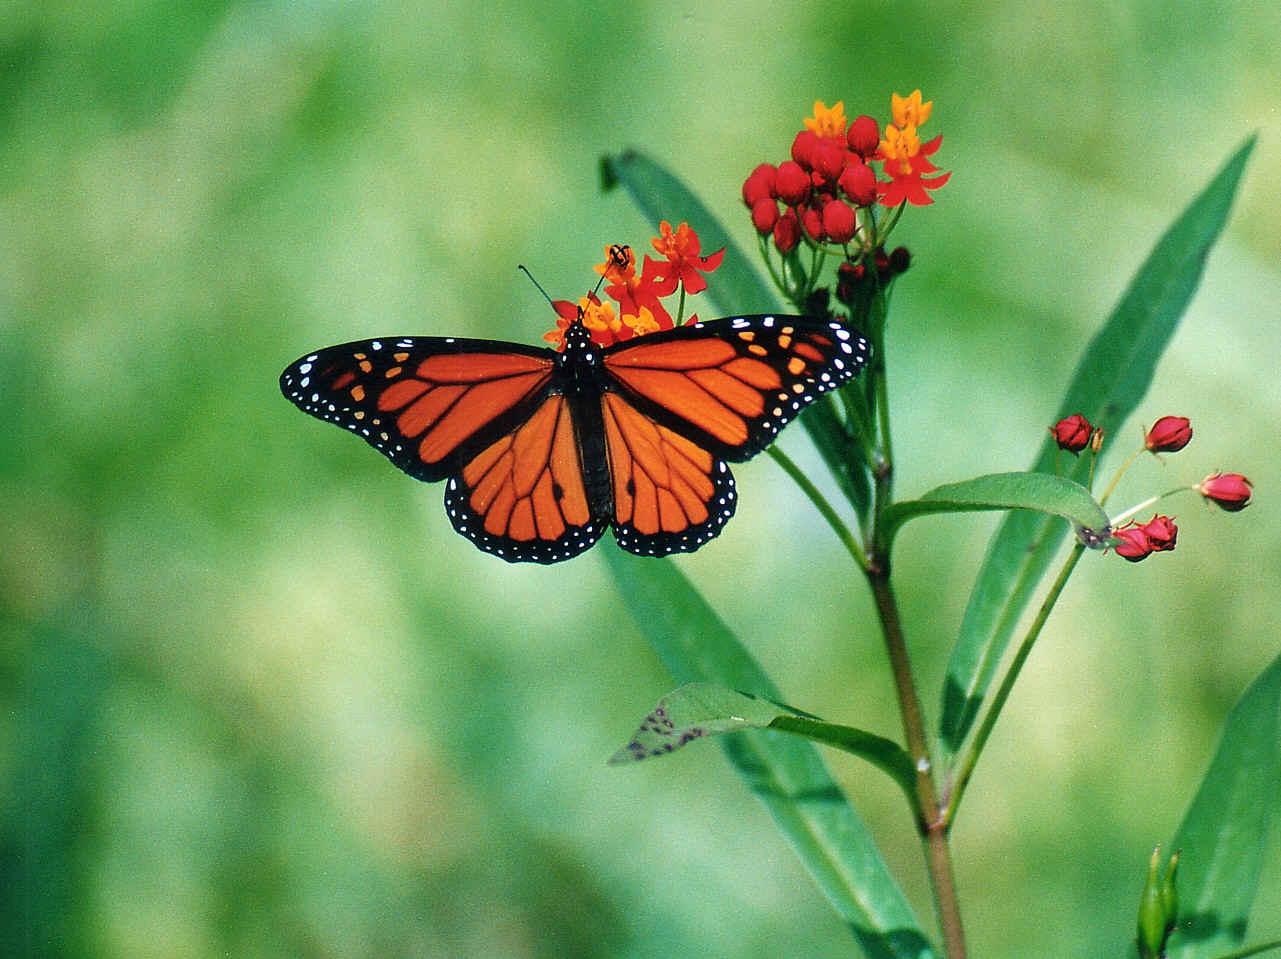 Beautiful Wallpapers For Desktop Beautiful HD Butterfly wallpapers 1281x959